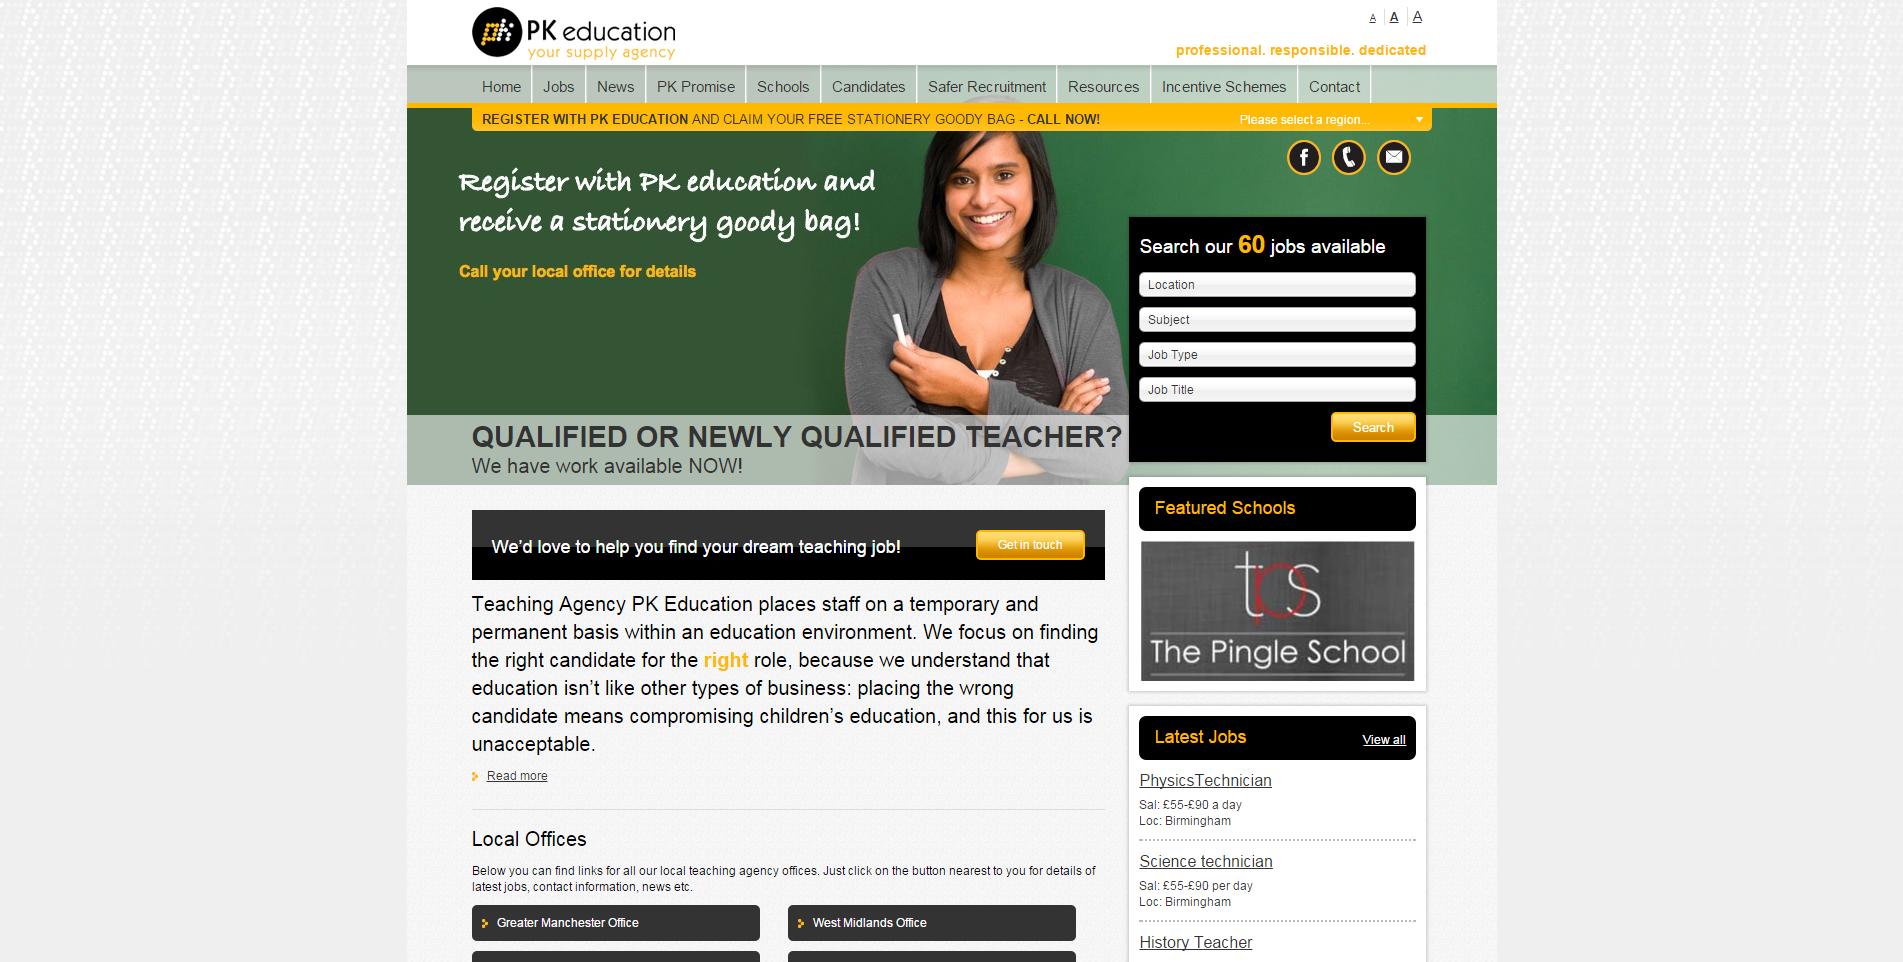 PK Education for teaching jobs in Manchester